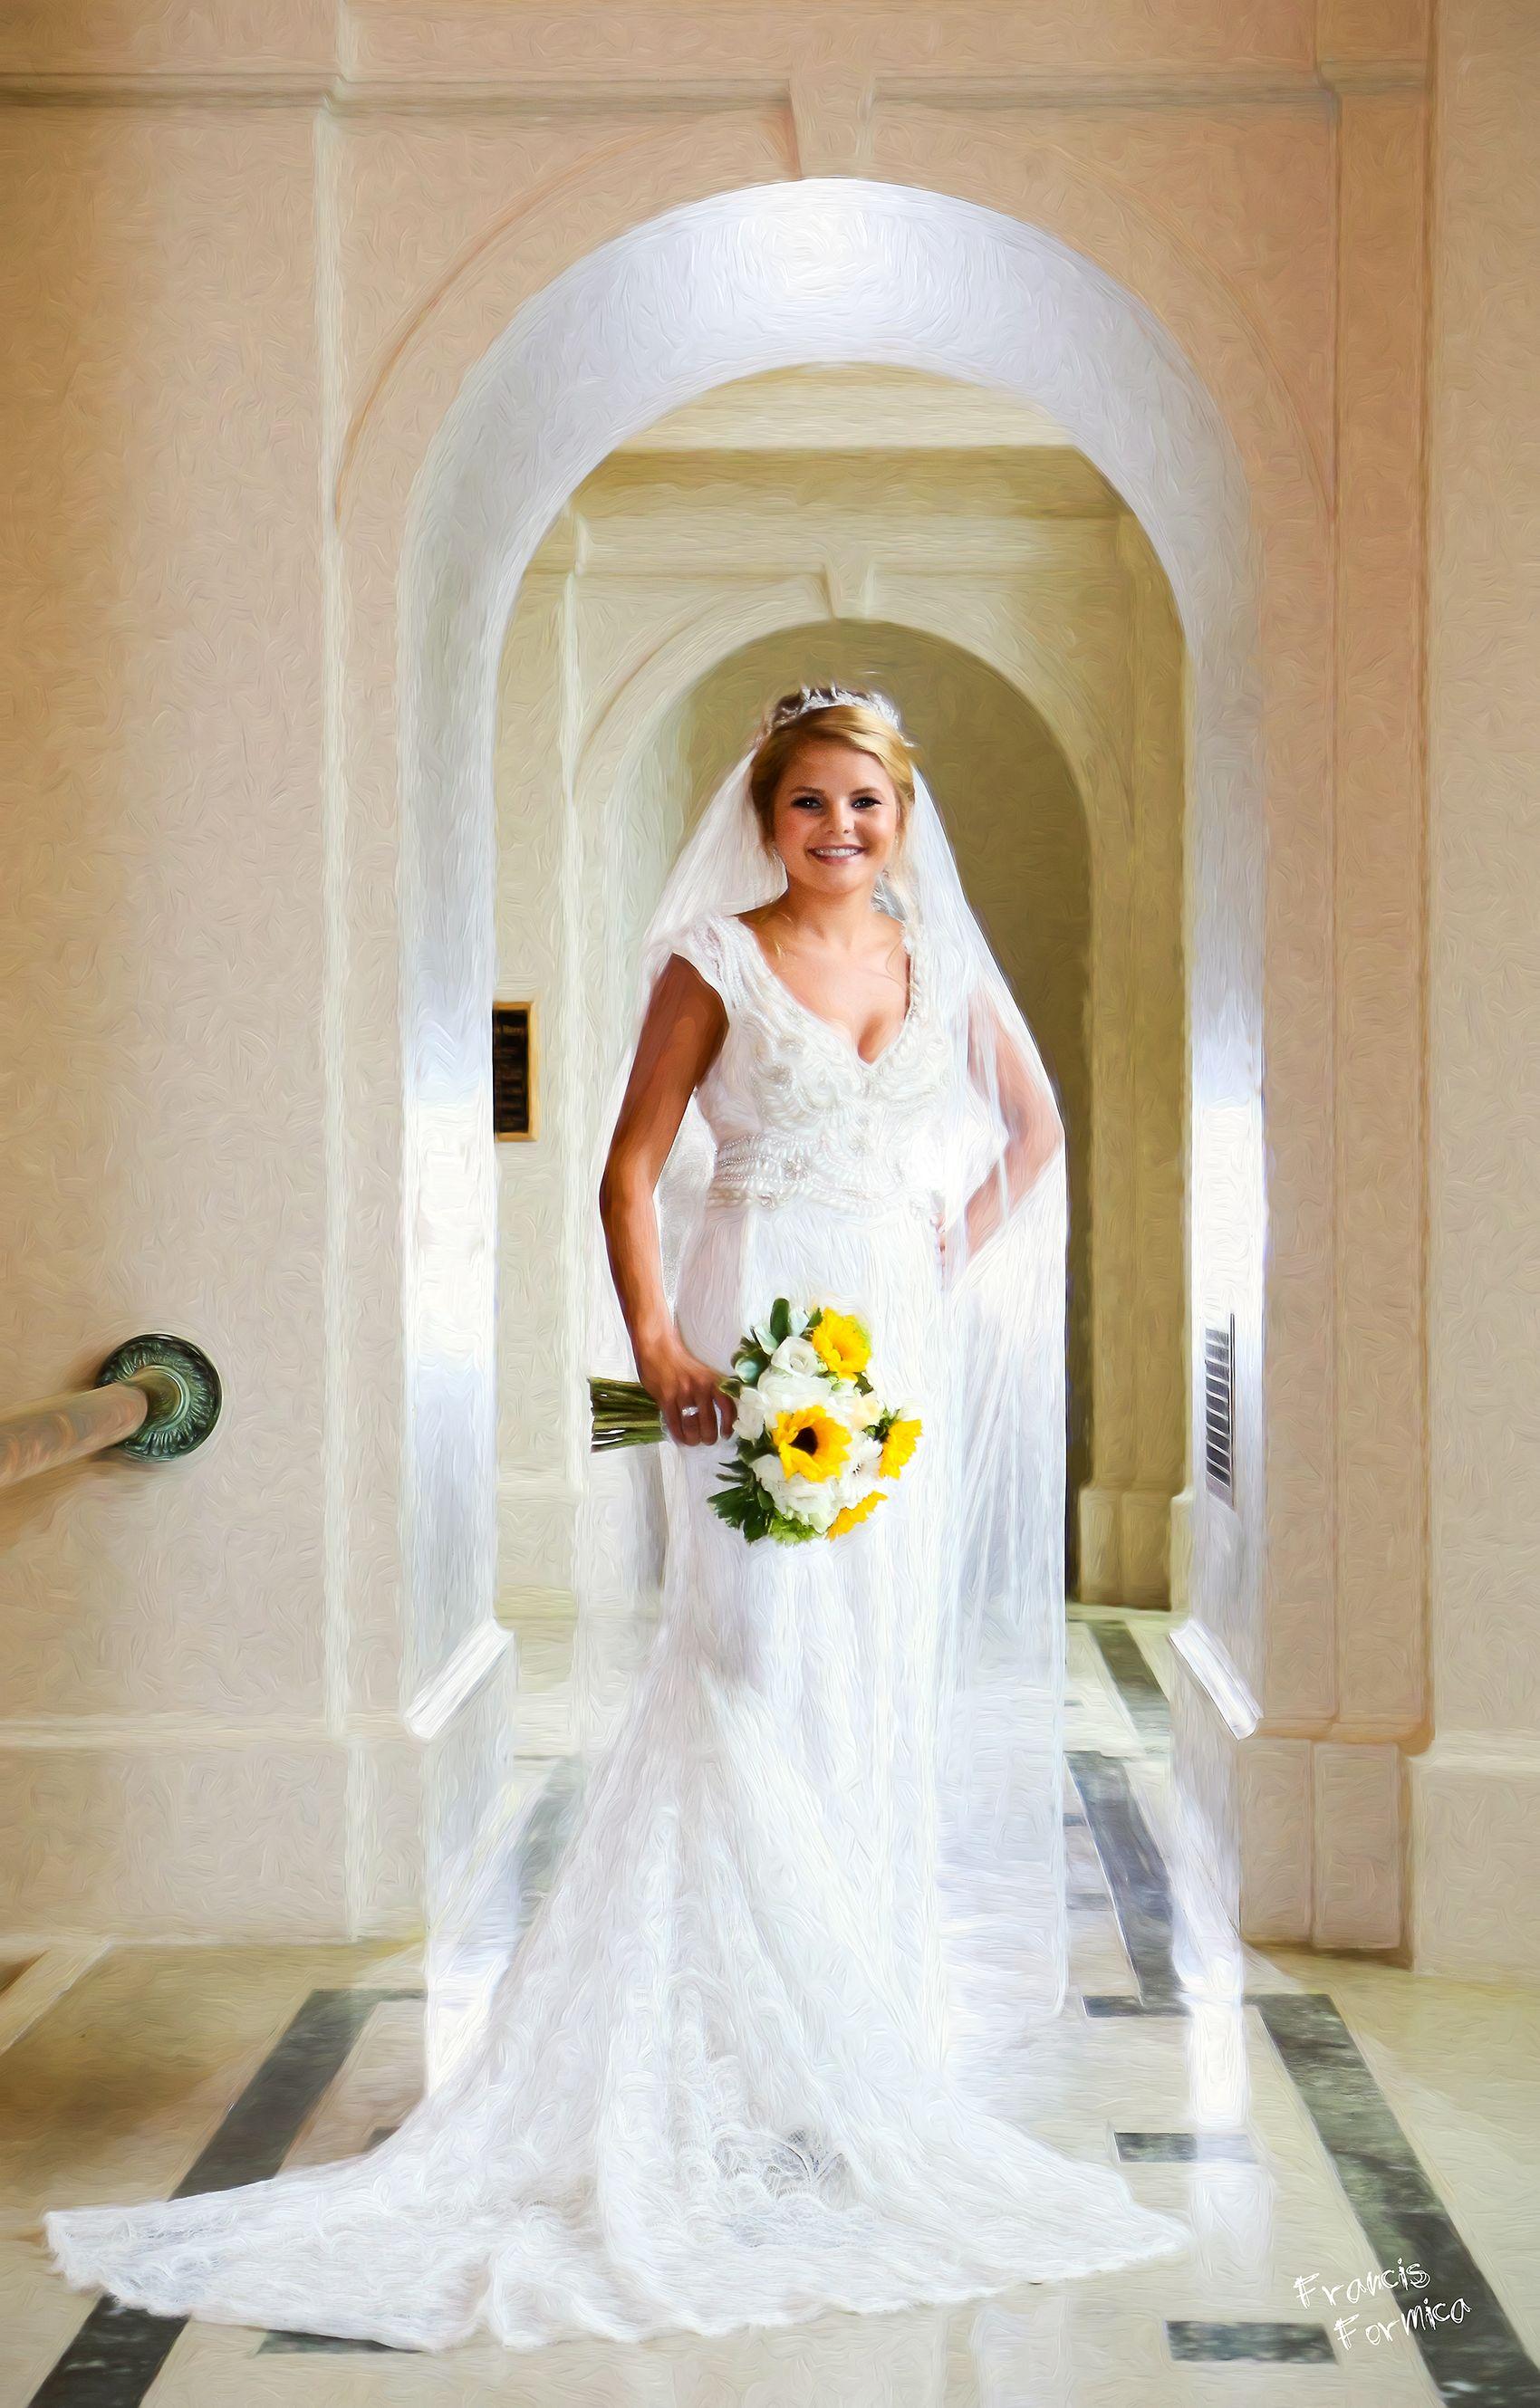 MahanHall Naval Acdemy Wedding.jpg